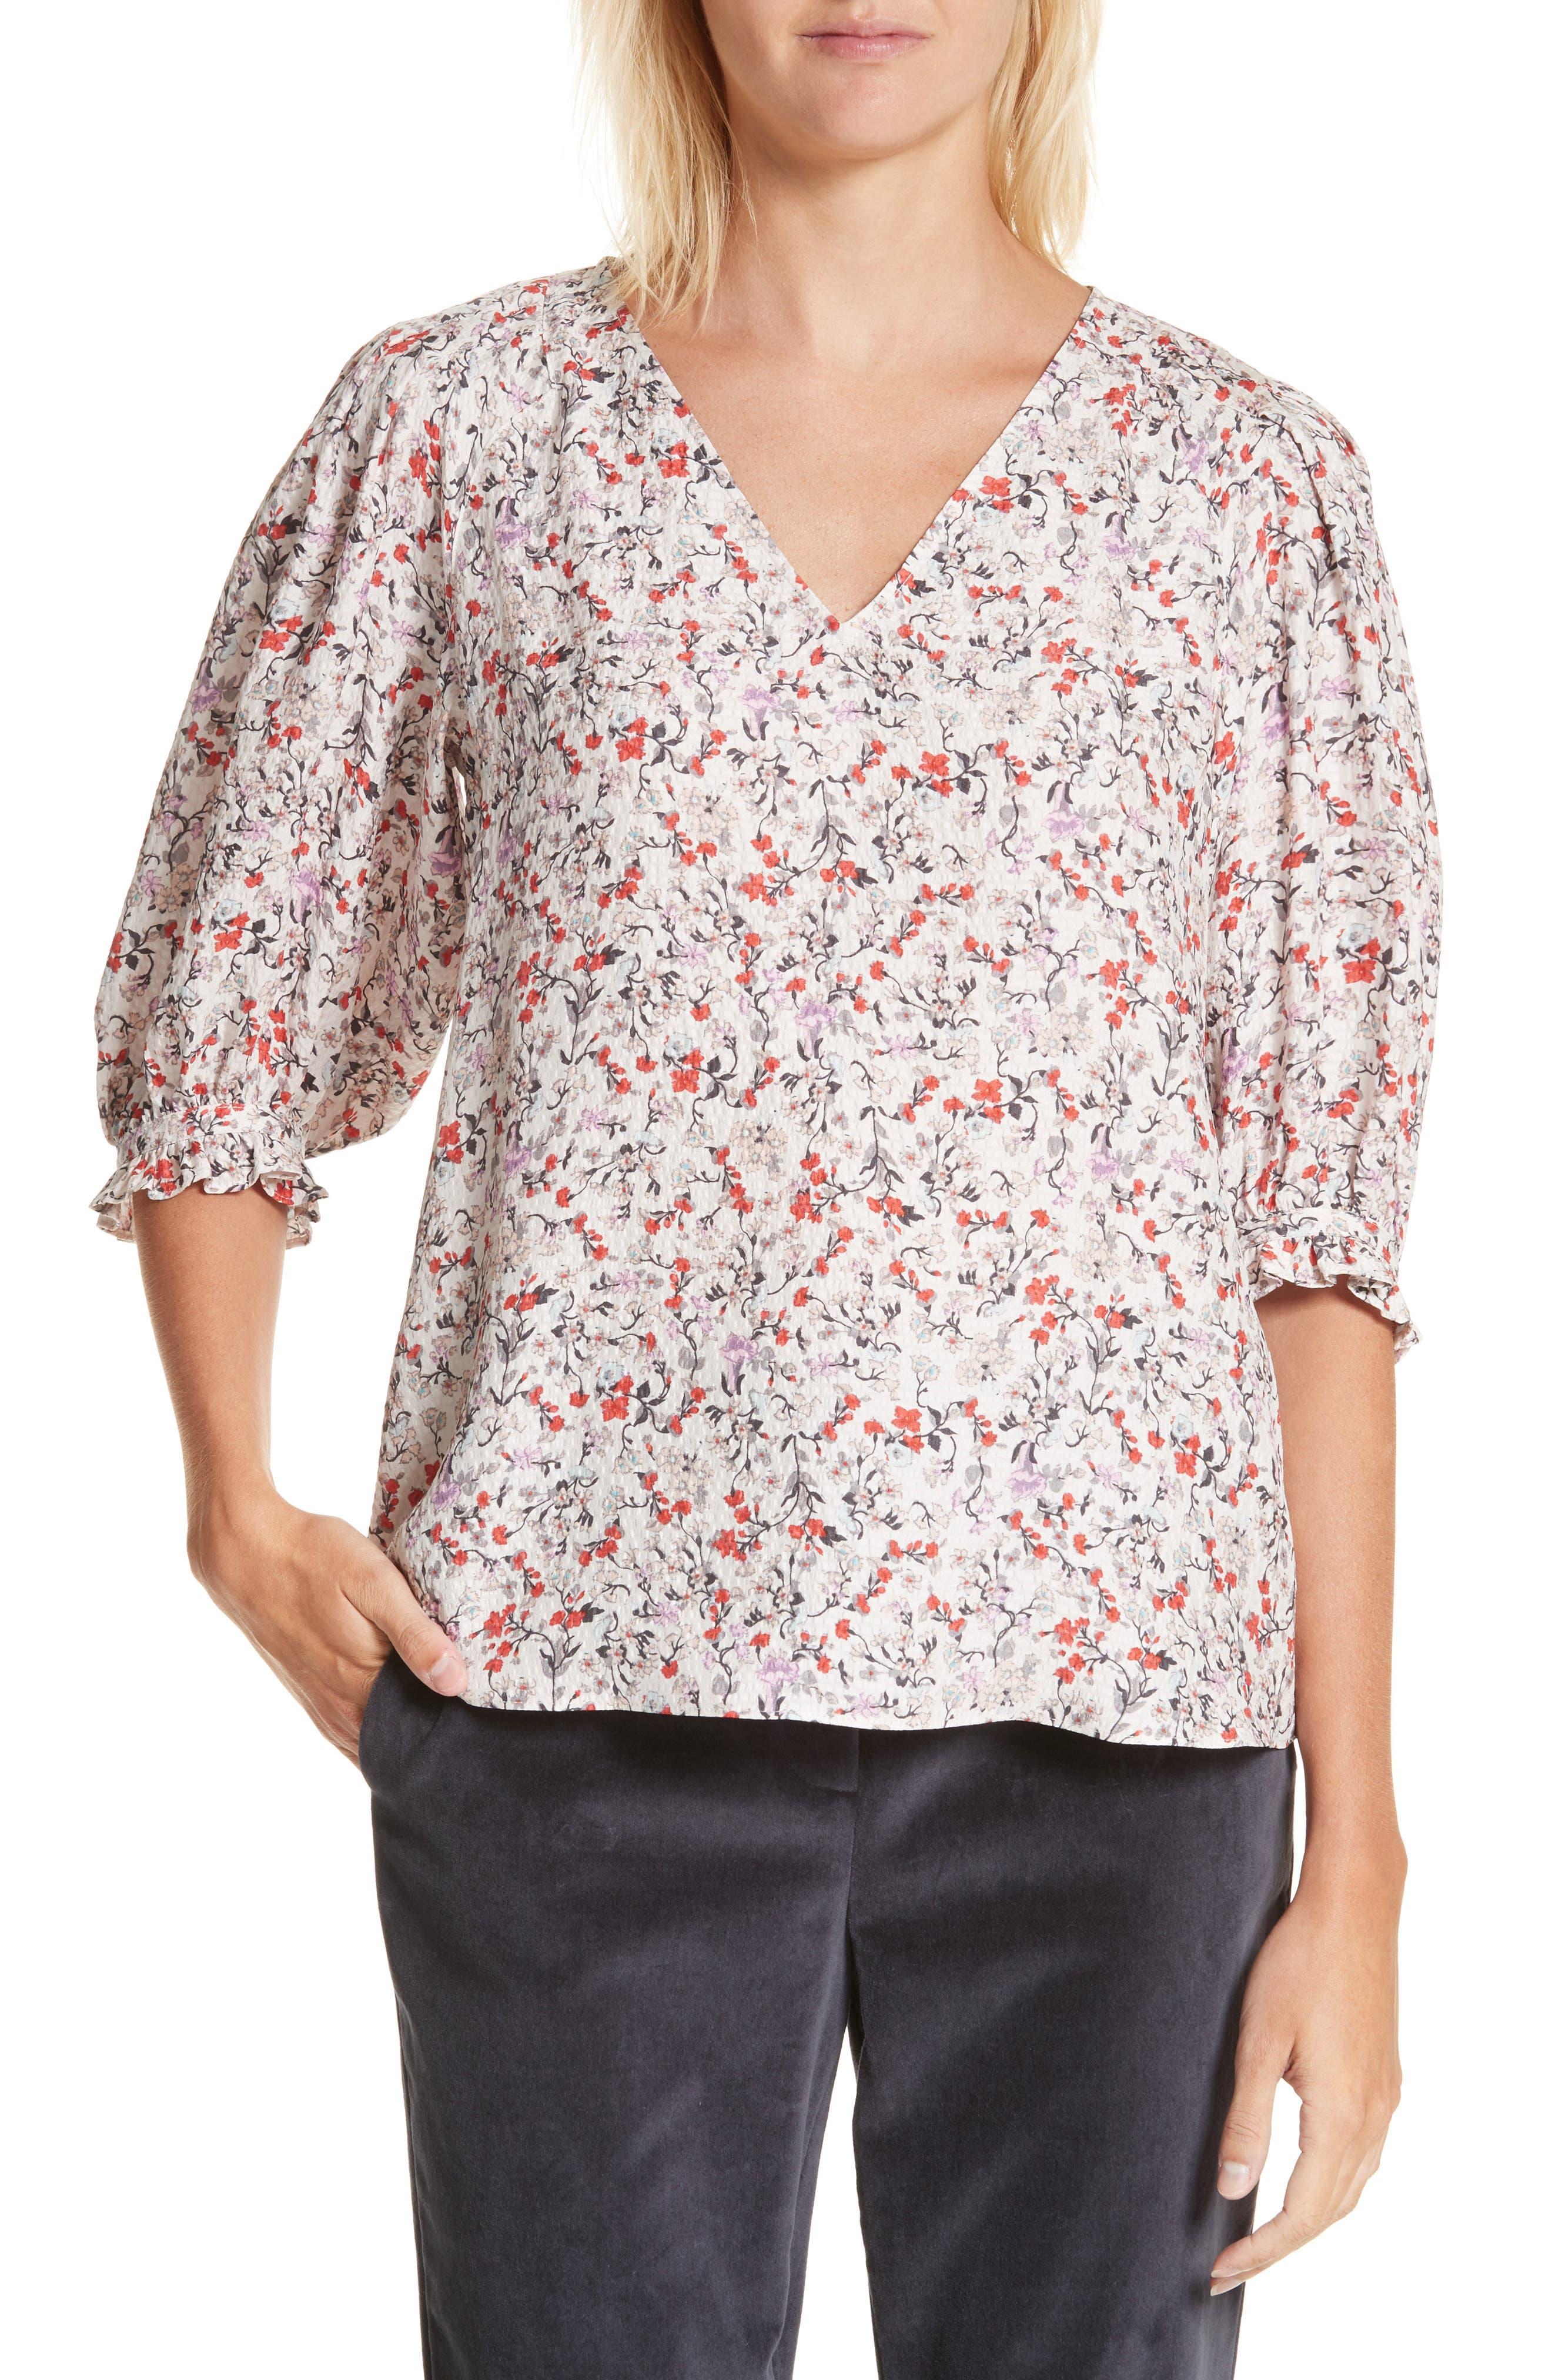 Main Image - Rebecca Taylor Lyra Floral Silk Top